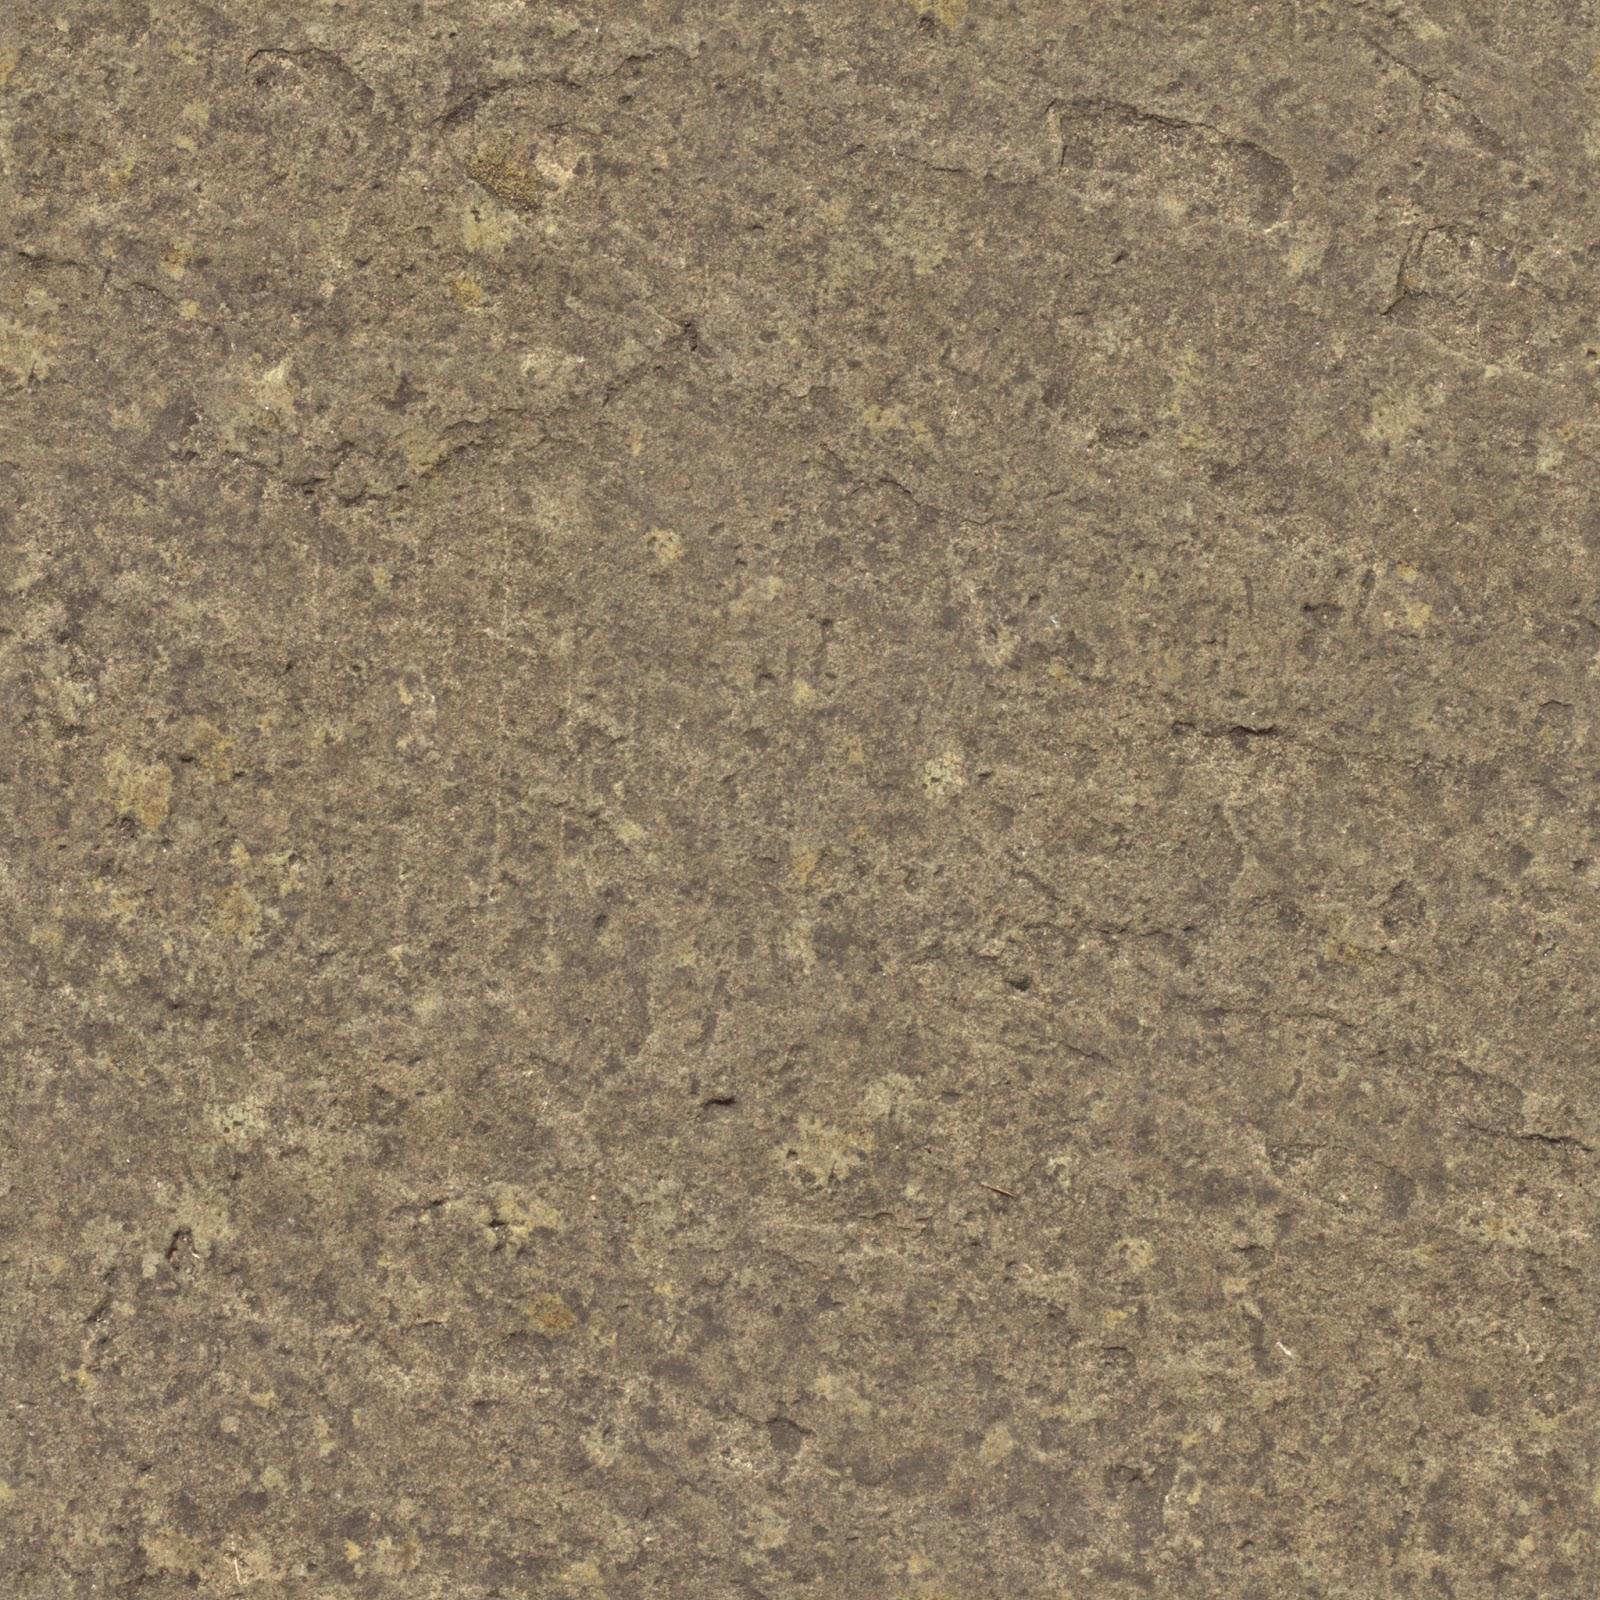 (Stone 3) rock cave mountain brown seamless texture 2048x2048